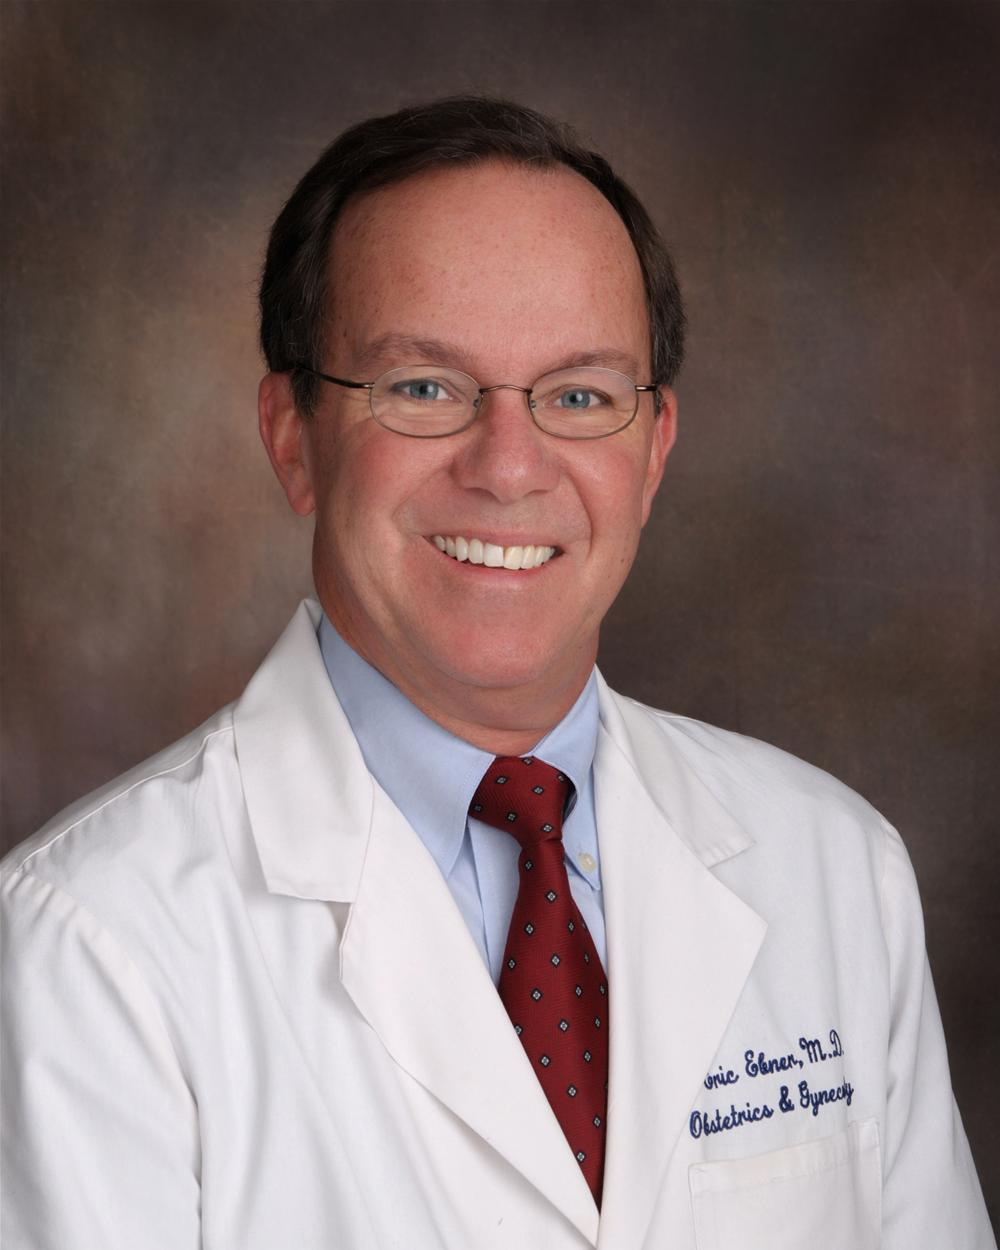 Eric Ebner MD